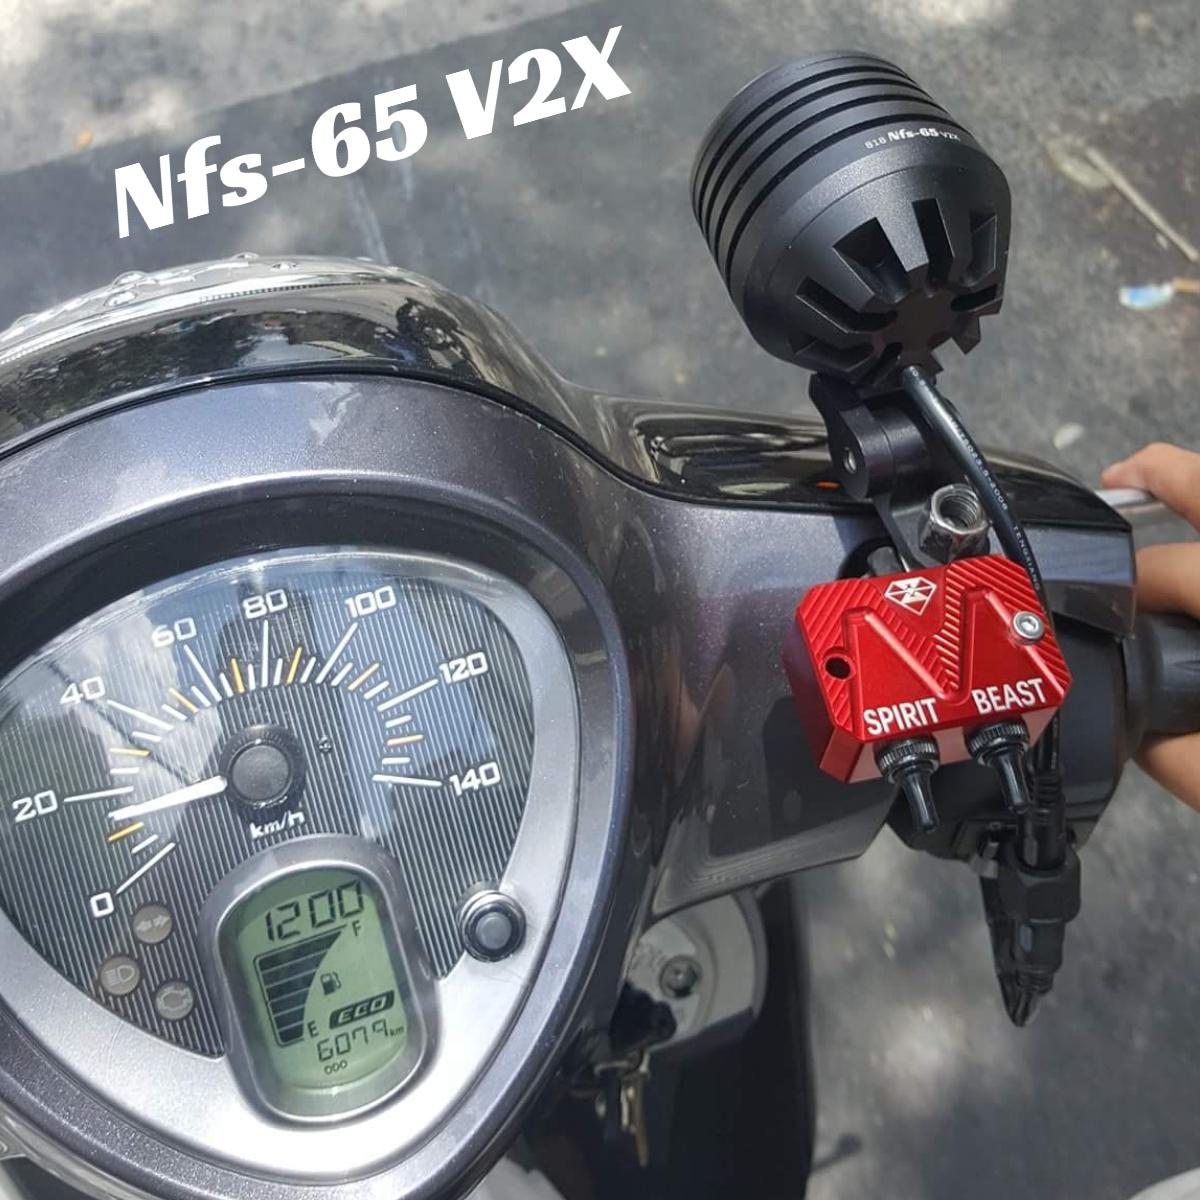 NFS-65 X 2018